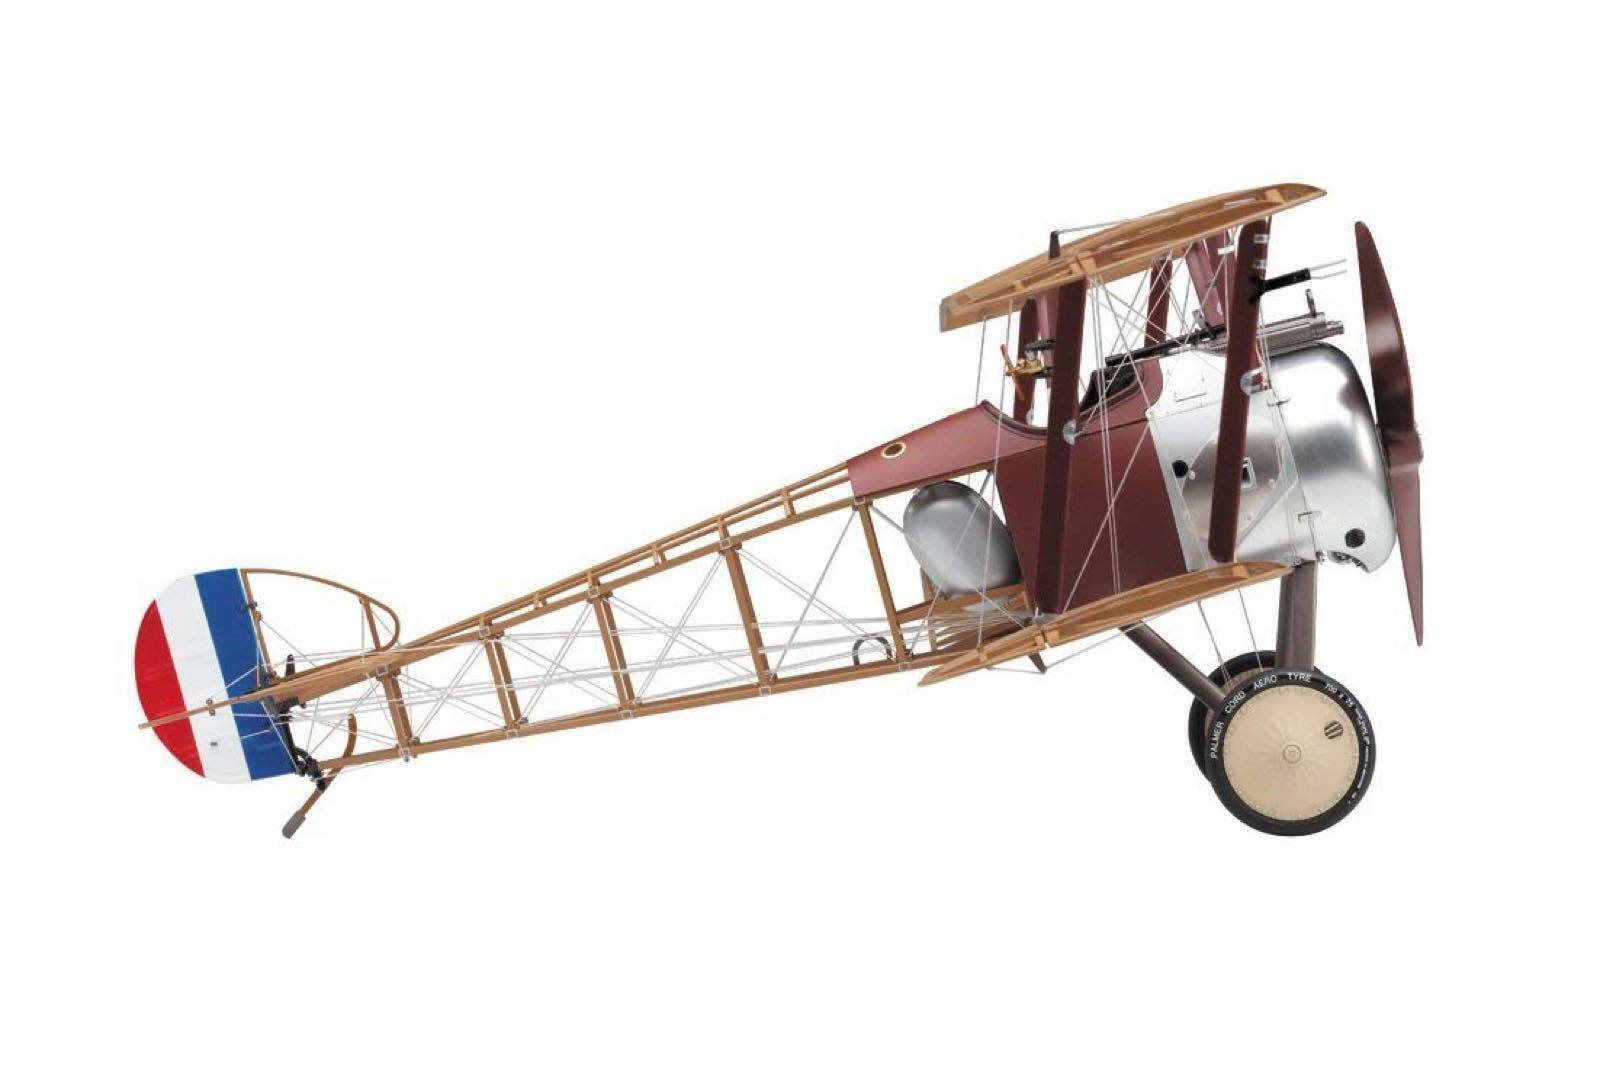 Hasegawa MU01 WW1 British Fighter Sopwith CAMEL F.1 Museum Model 1 16 kit New